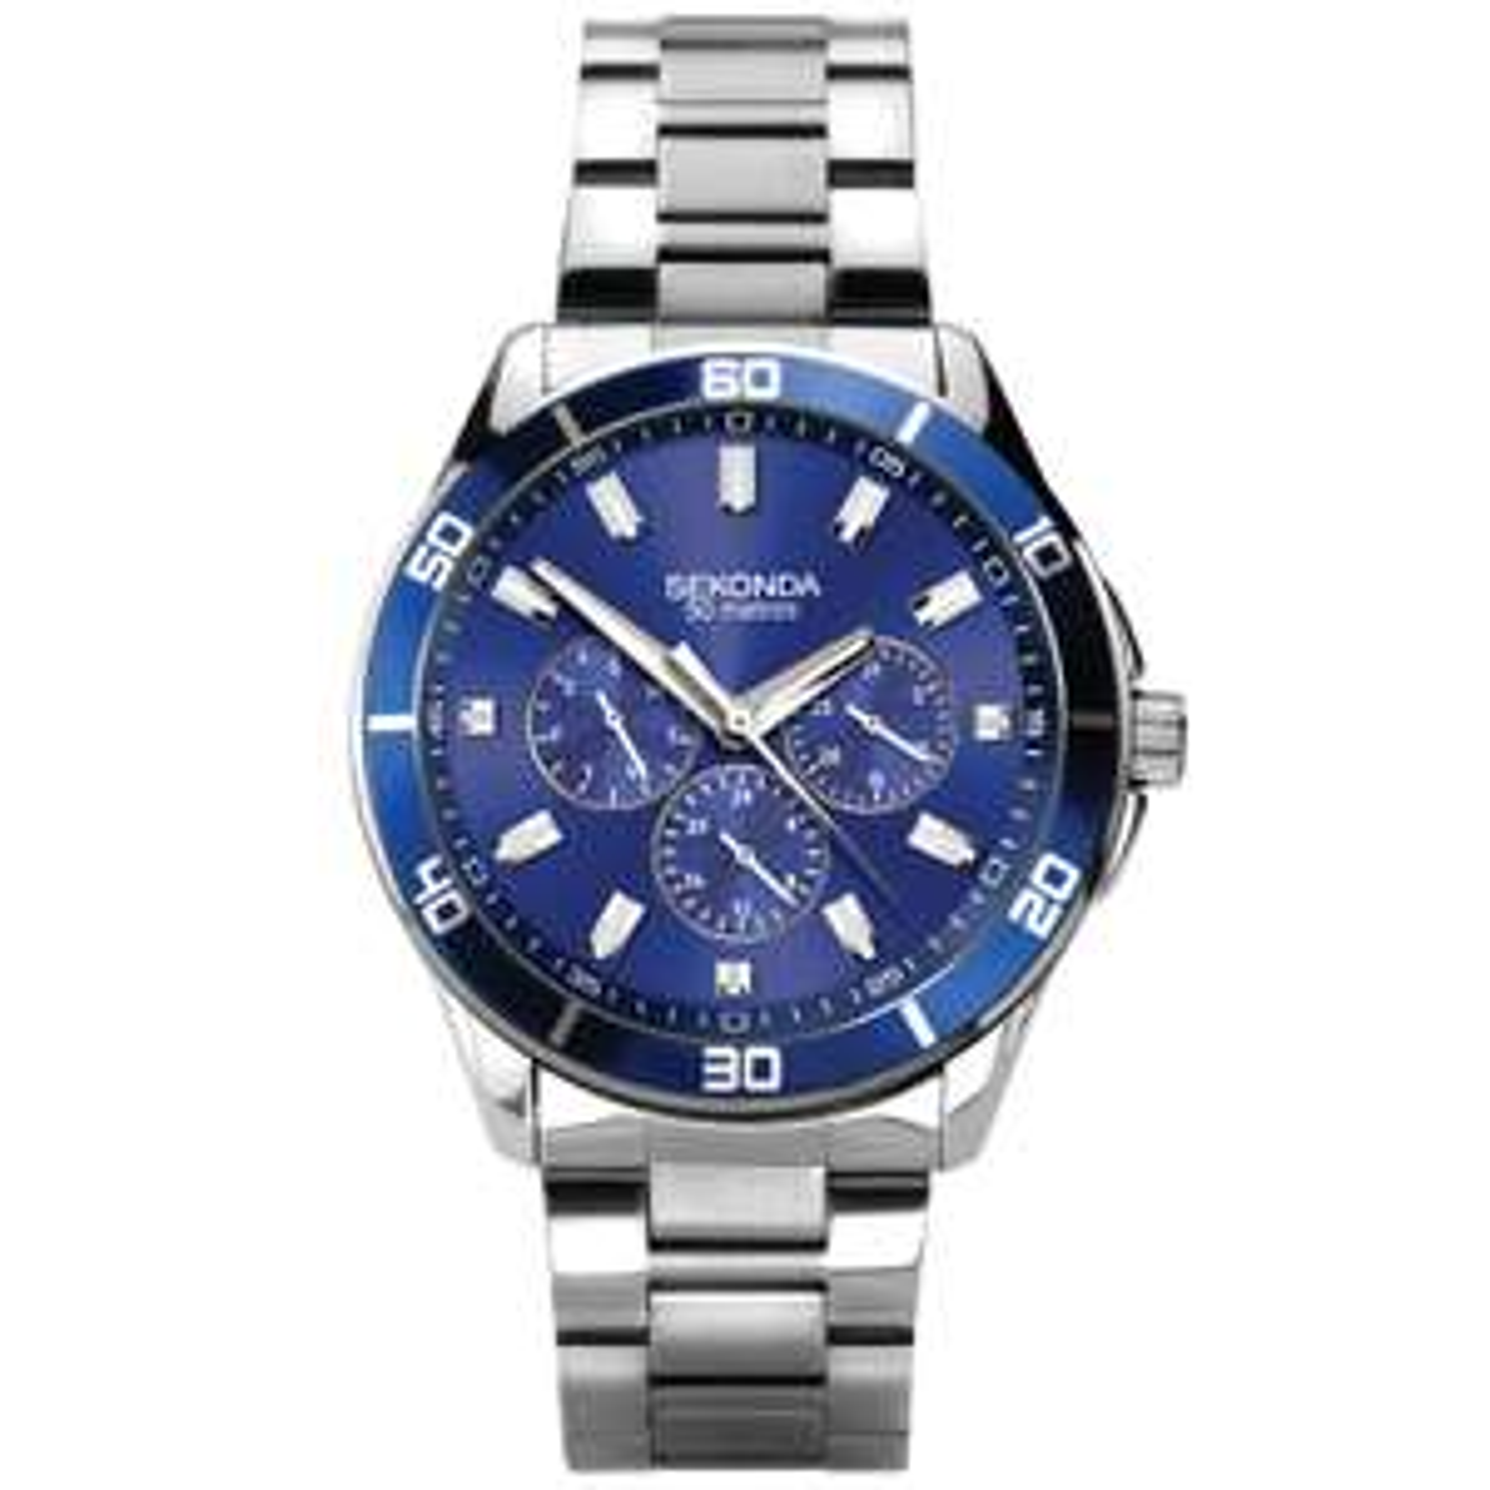 Sekonda Men's Stainless Steel Bracelet Watch - £27.99 with code at H.Samuel